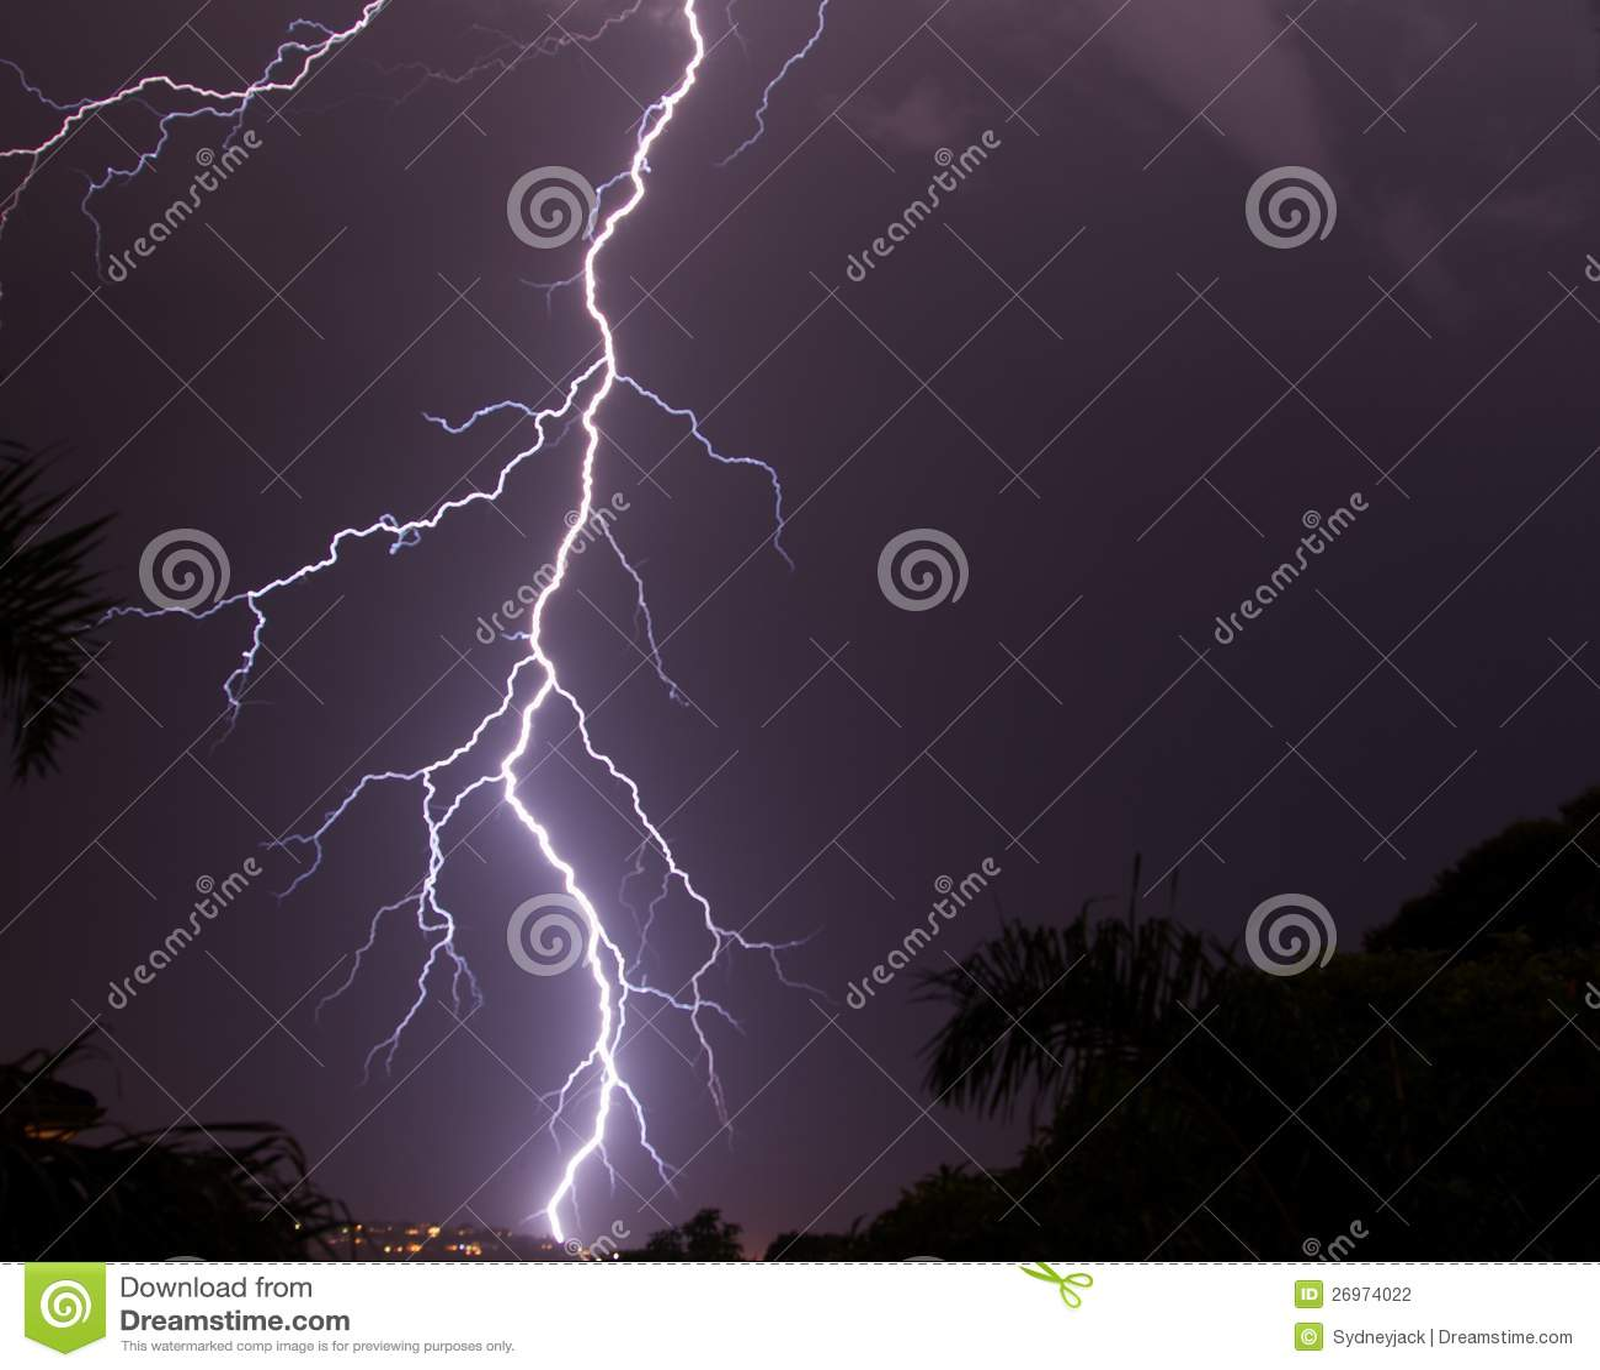 Lightning strike in the night s sky